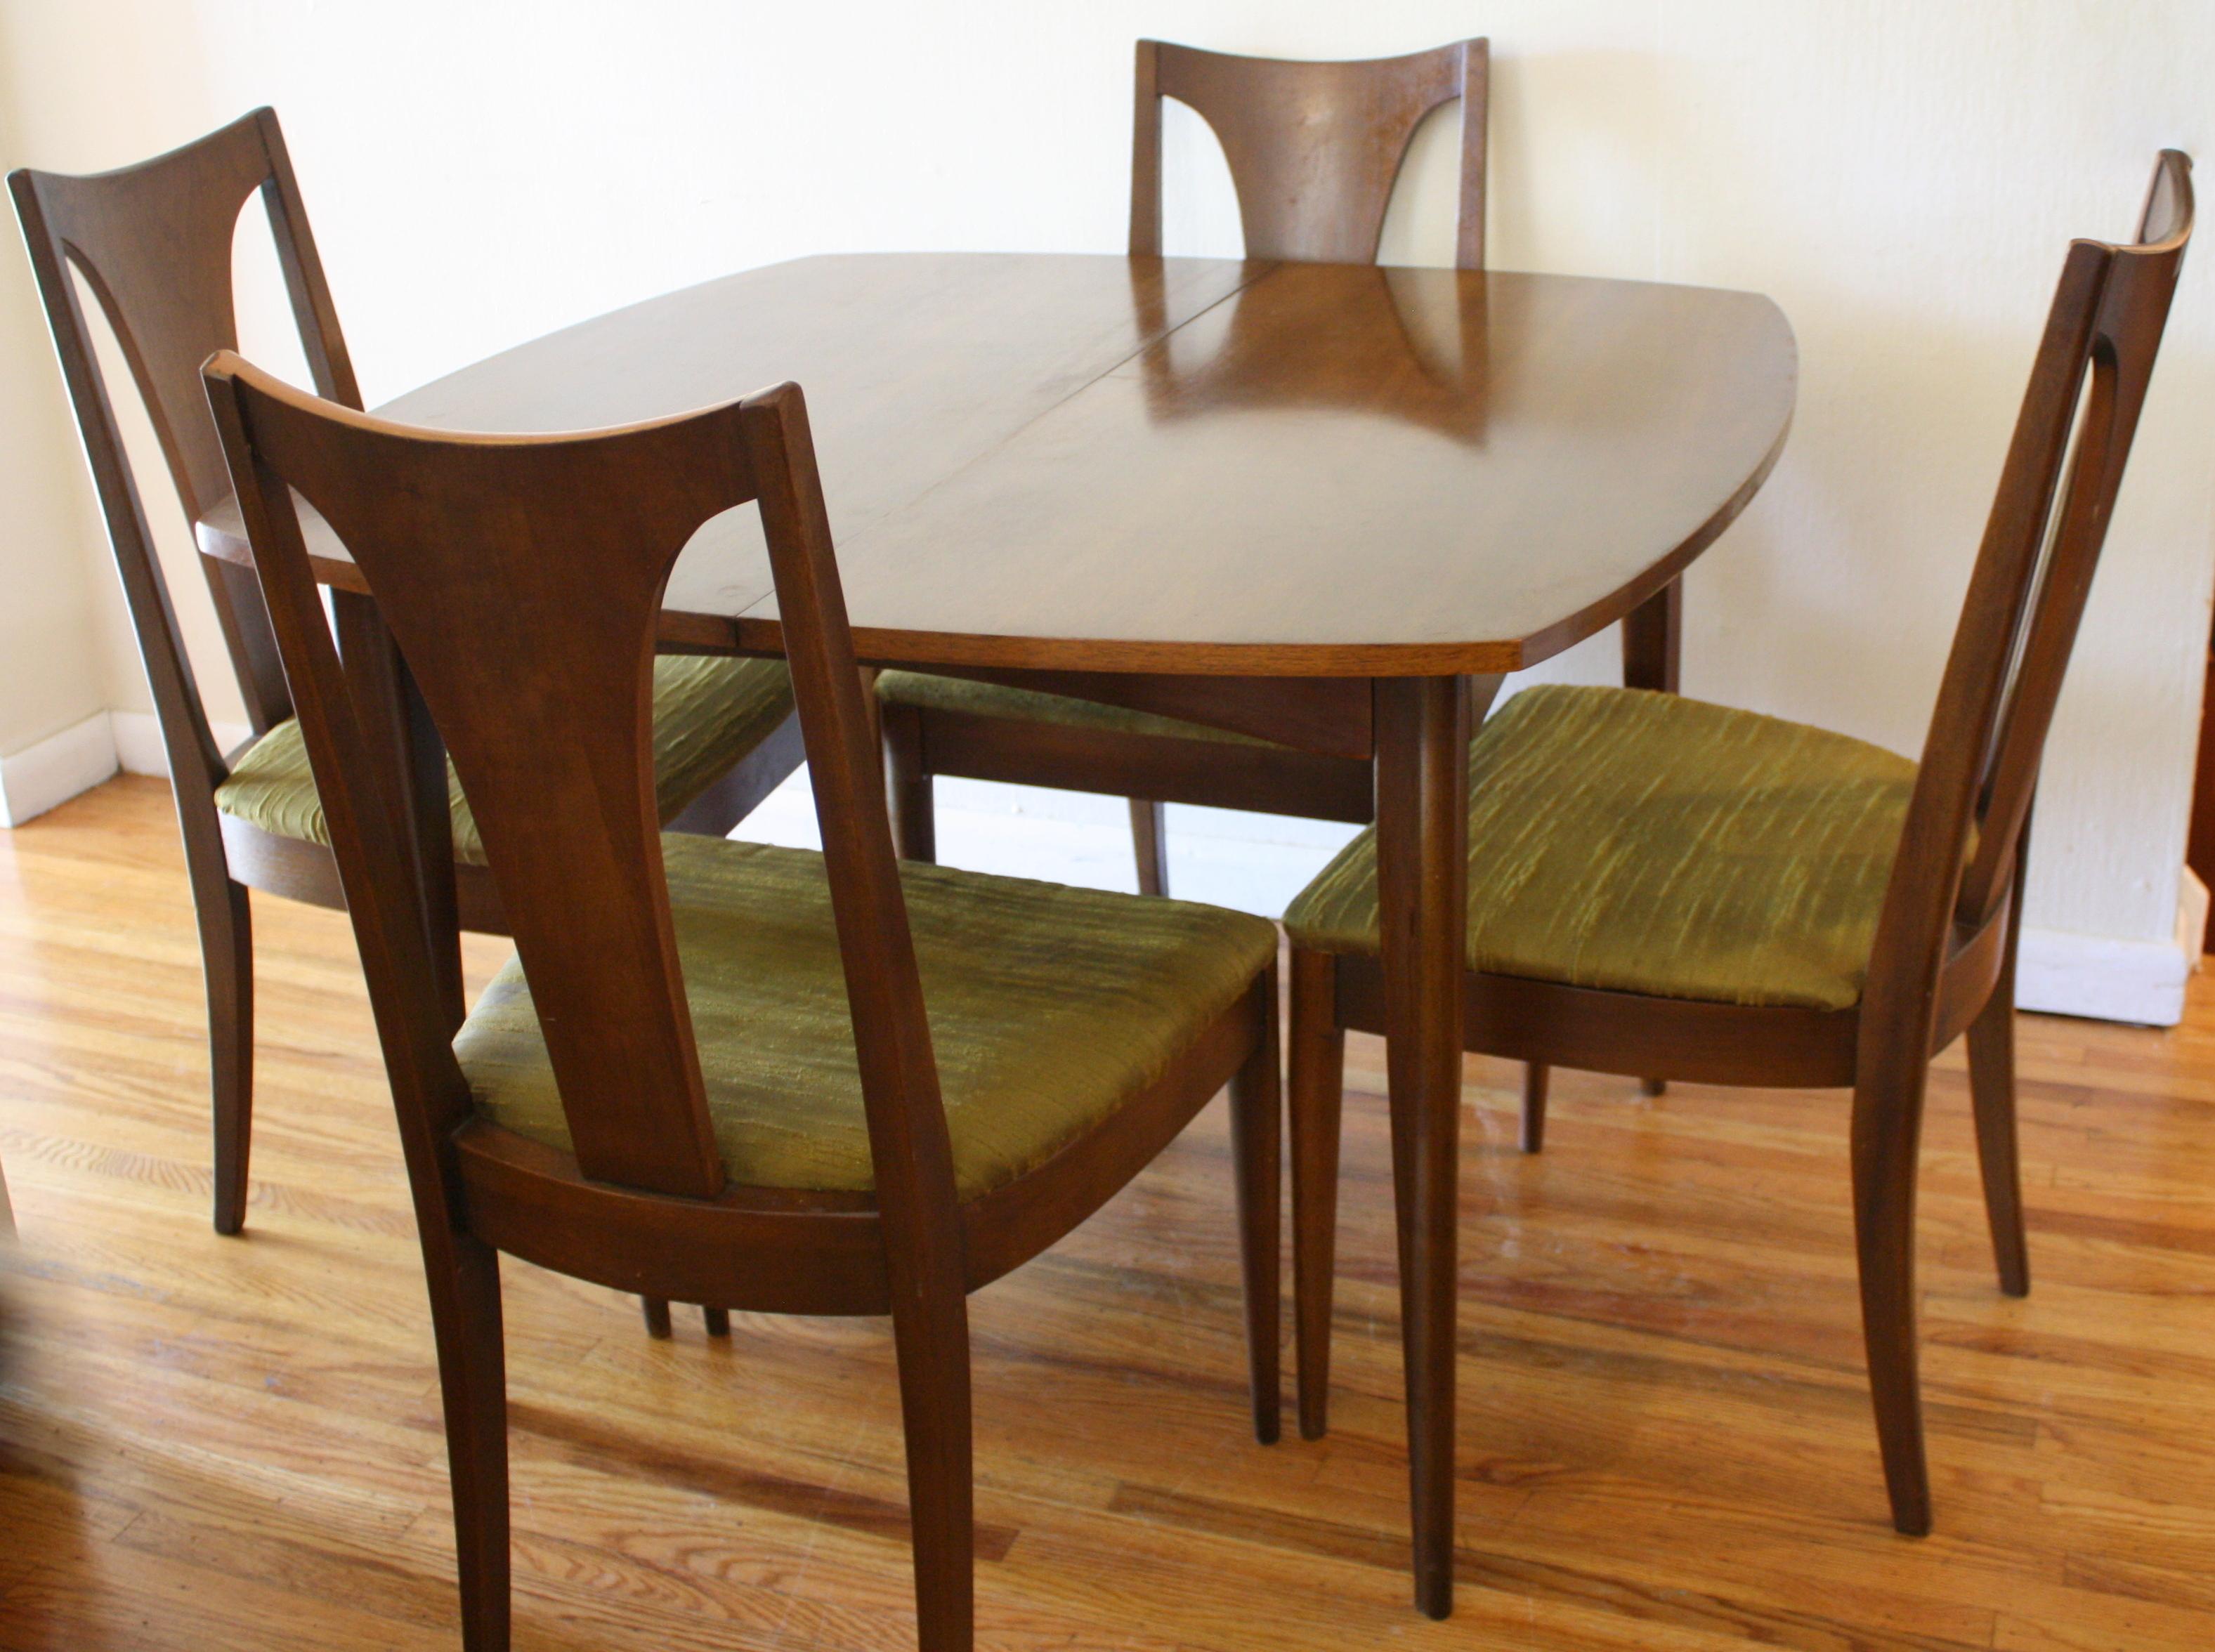 Mid Century Modern Dining Room Tables mid century modern dining table. image of design mid century